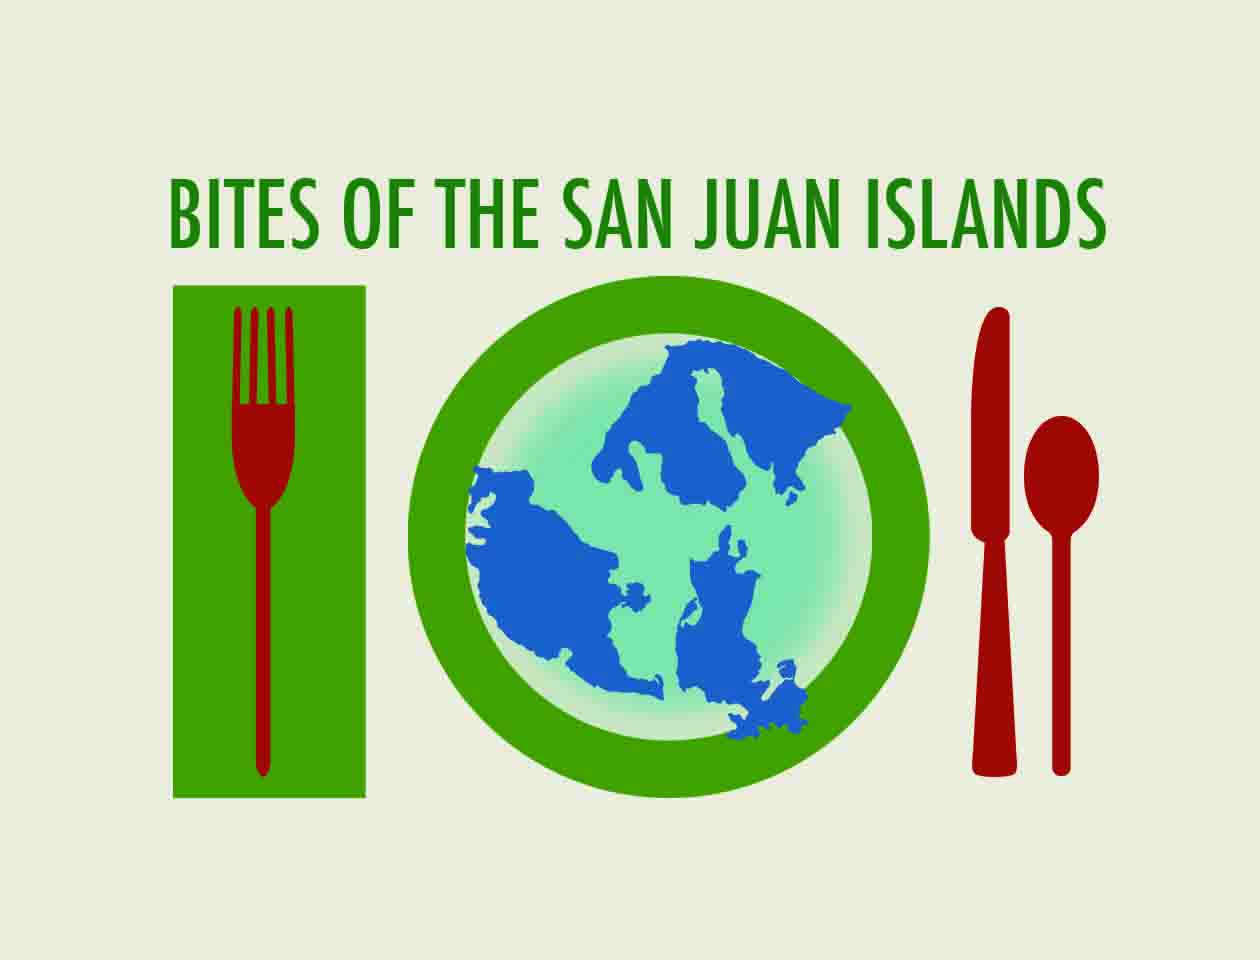 Bites of the San Juan Islands